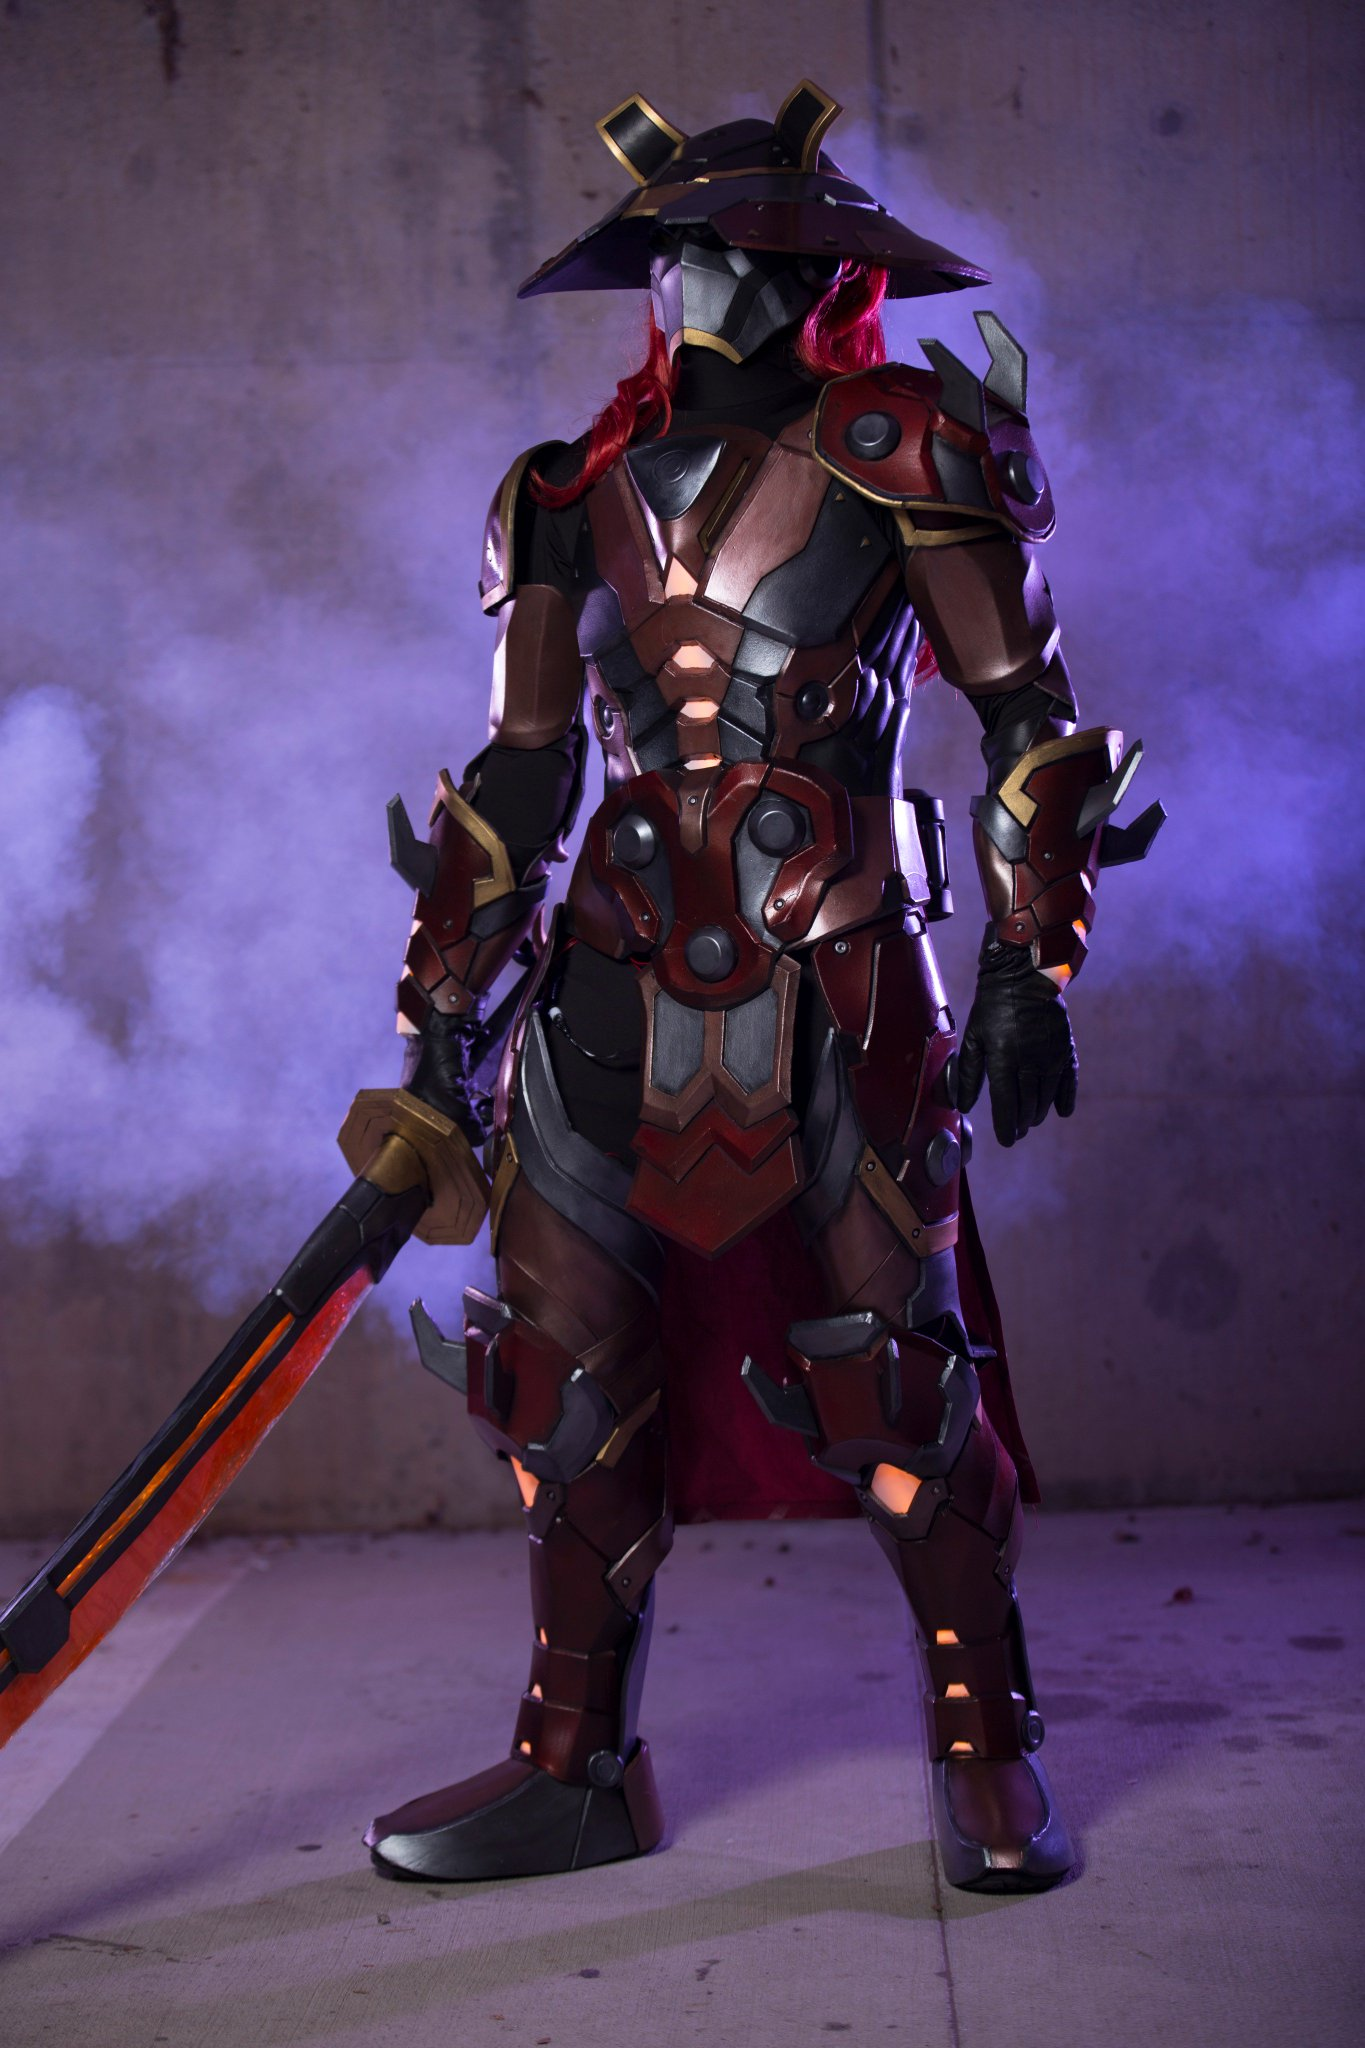 .@Bradiatore's Steel Samurai Susano cosplay is electrifying!  📸 : @Afflictioncos1 https://t.co/odvxzjK45G